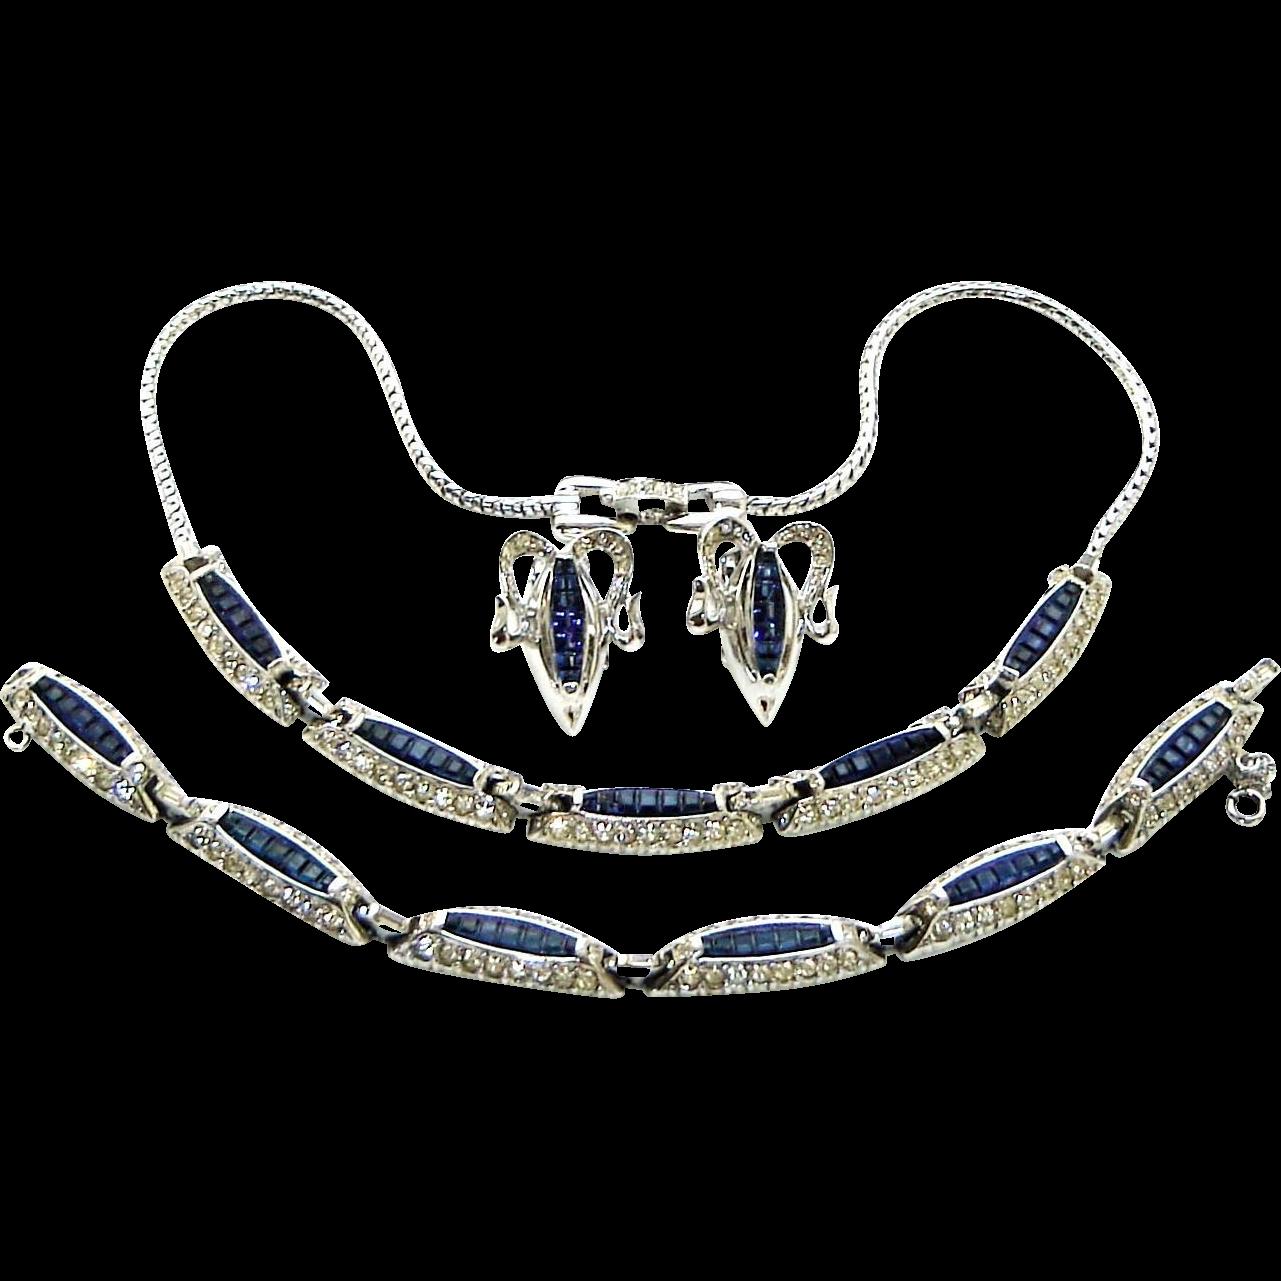 Vintage Reja Necklace Bracelet Earrings Invisibly Set Blue Rhinestones